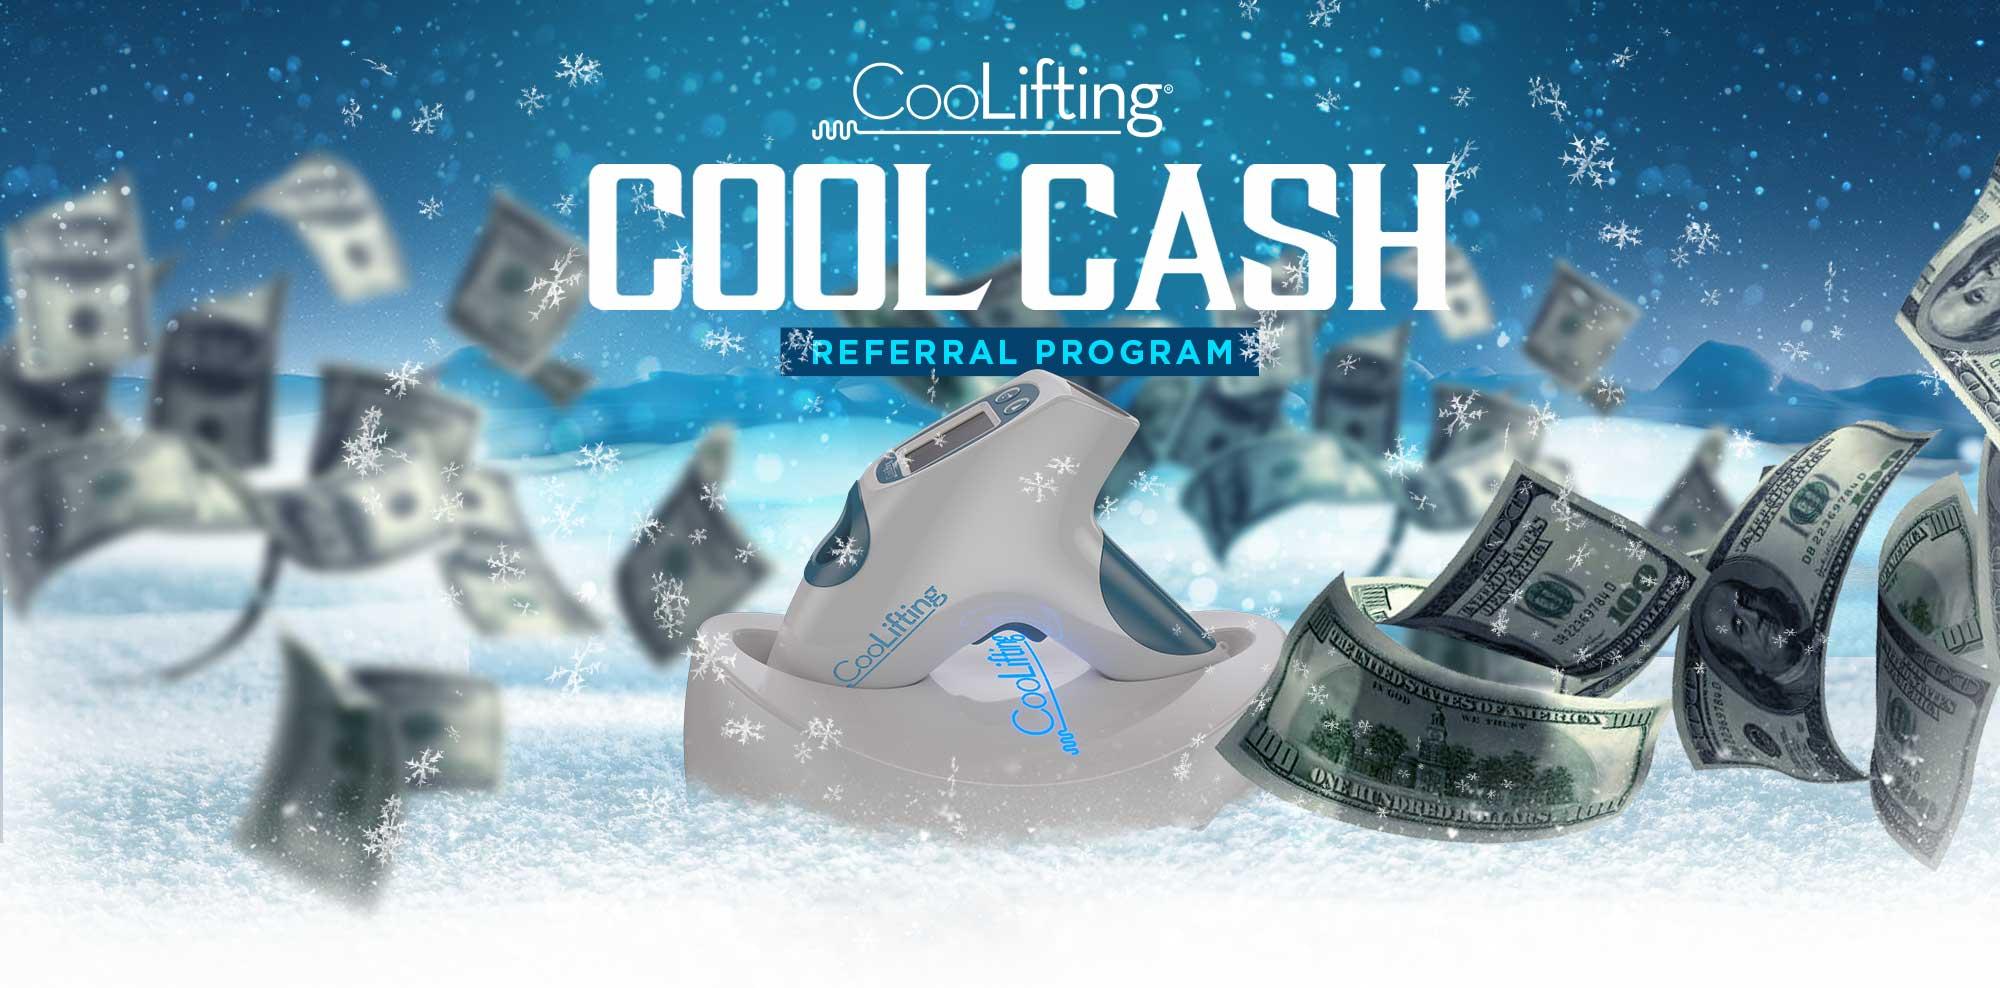 cool-cash-web-banner